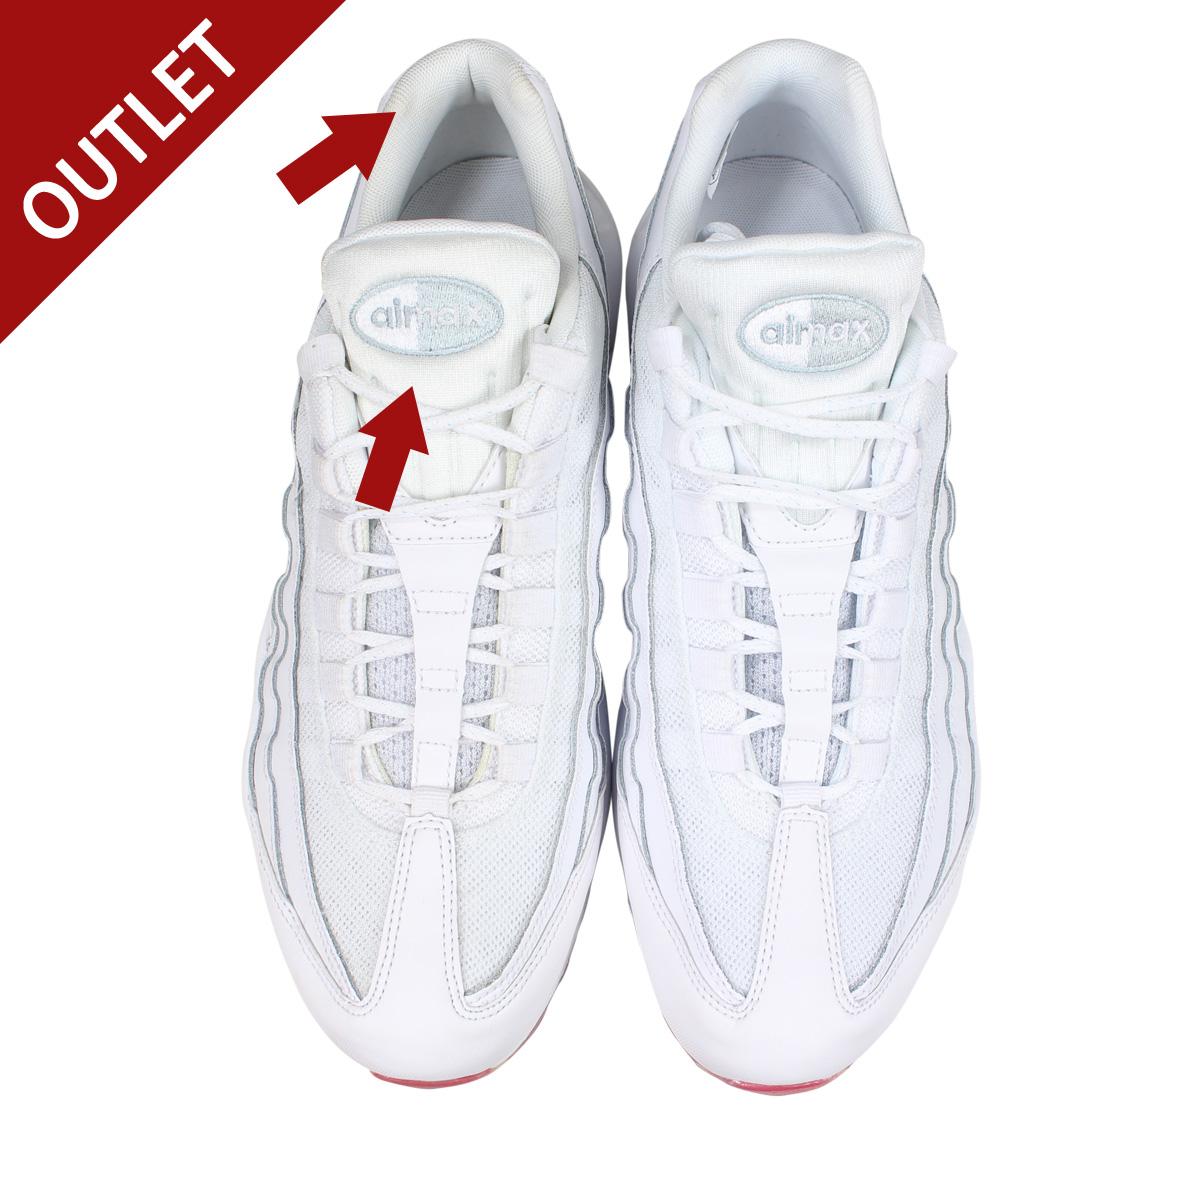 dc8f2274f7 ... Nike NIKE Air Max 95 sneakers men AIR MAX 95 white white AQ7981-100